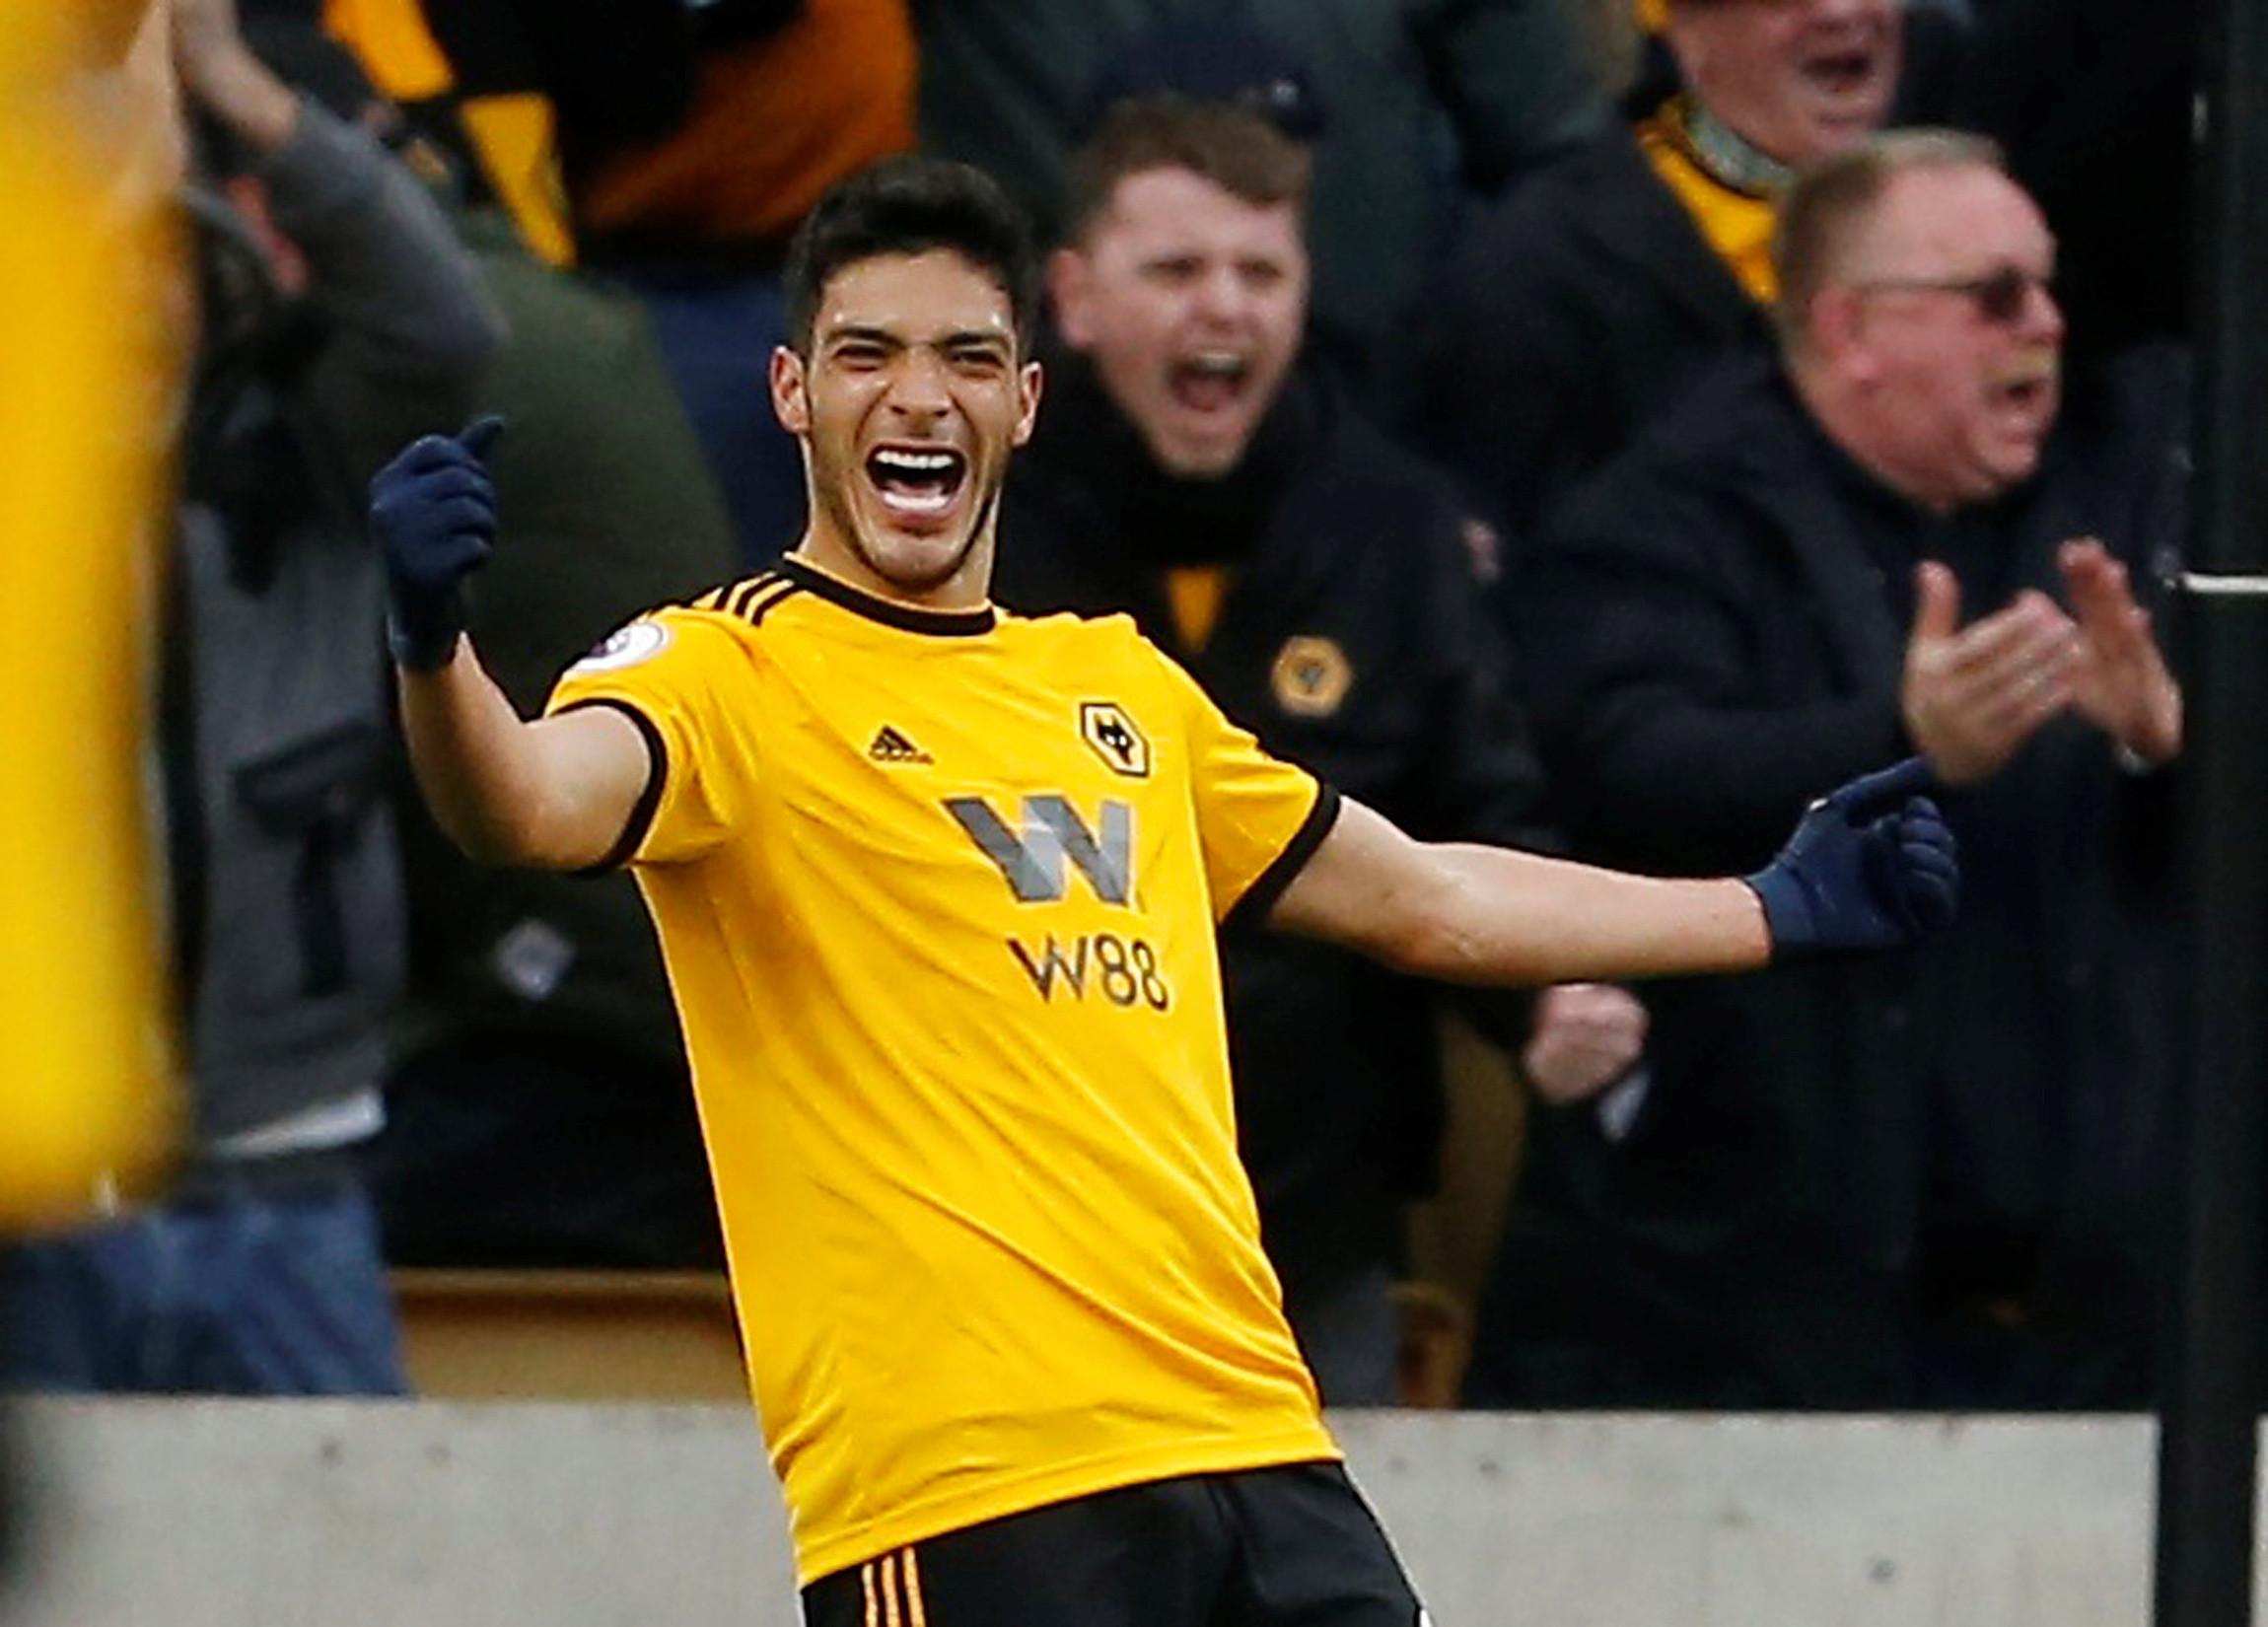 Oficial: Wolverhampton compra Raúl Jiménez ao Benfica